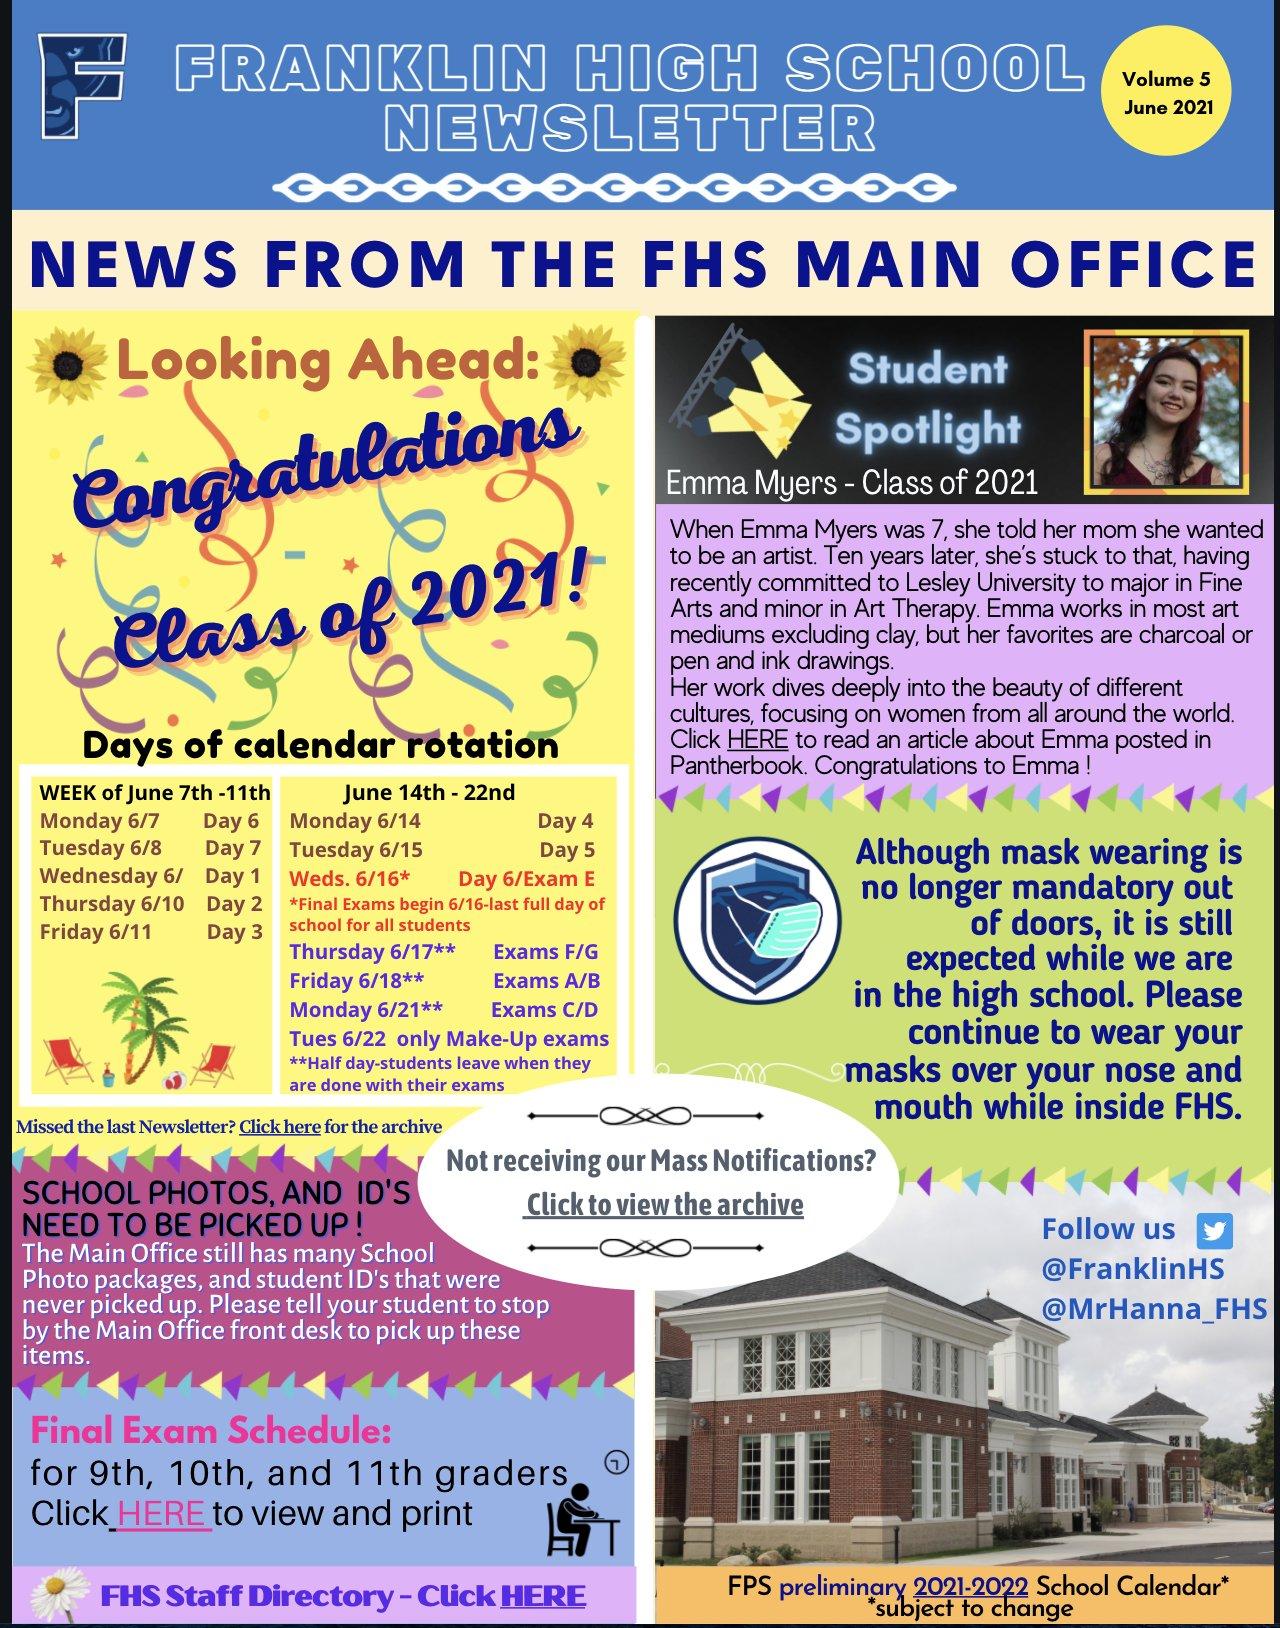 Franklin High School: Newsletter